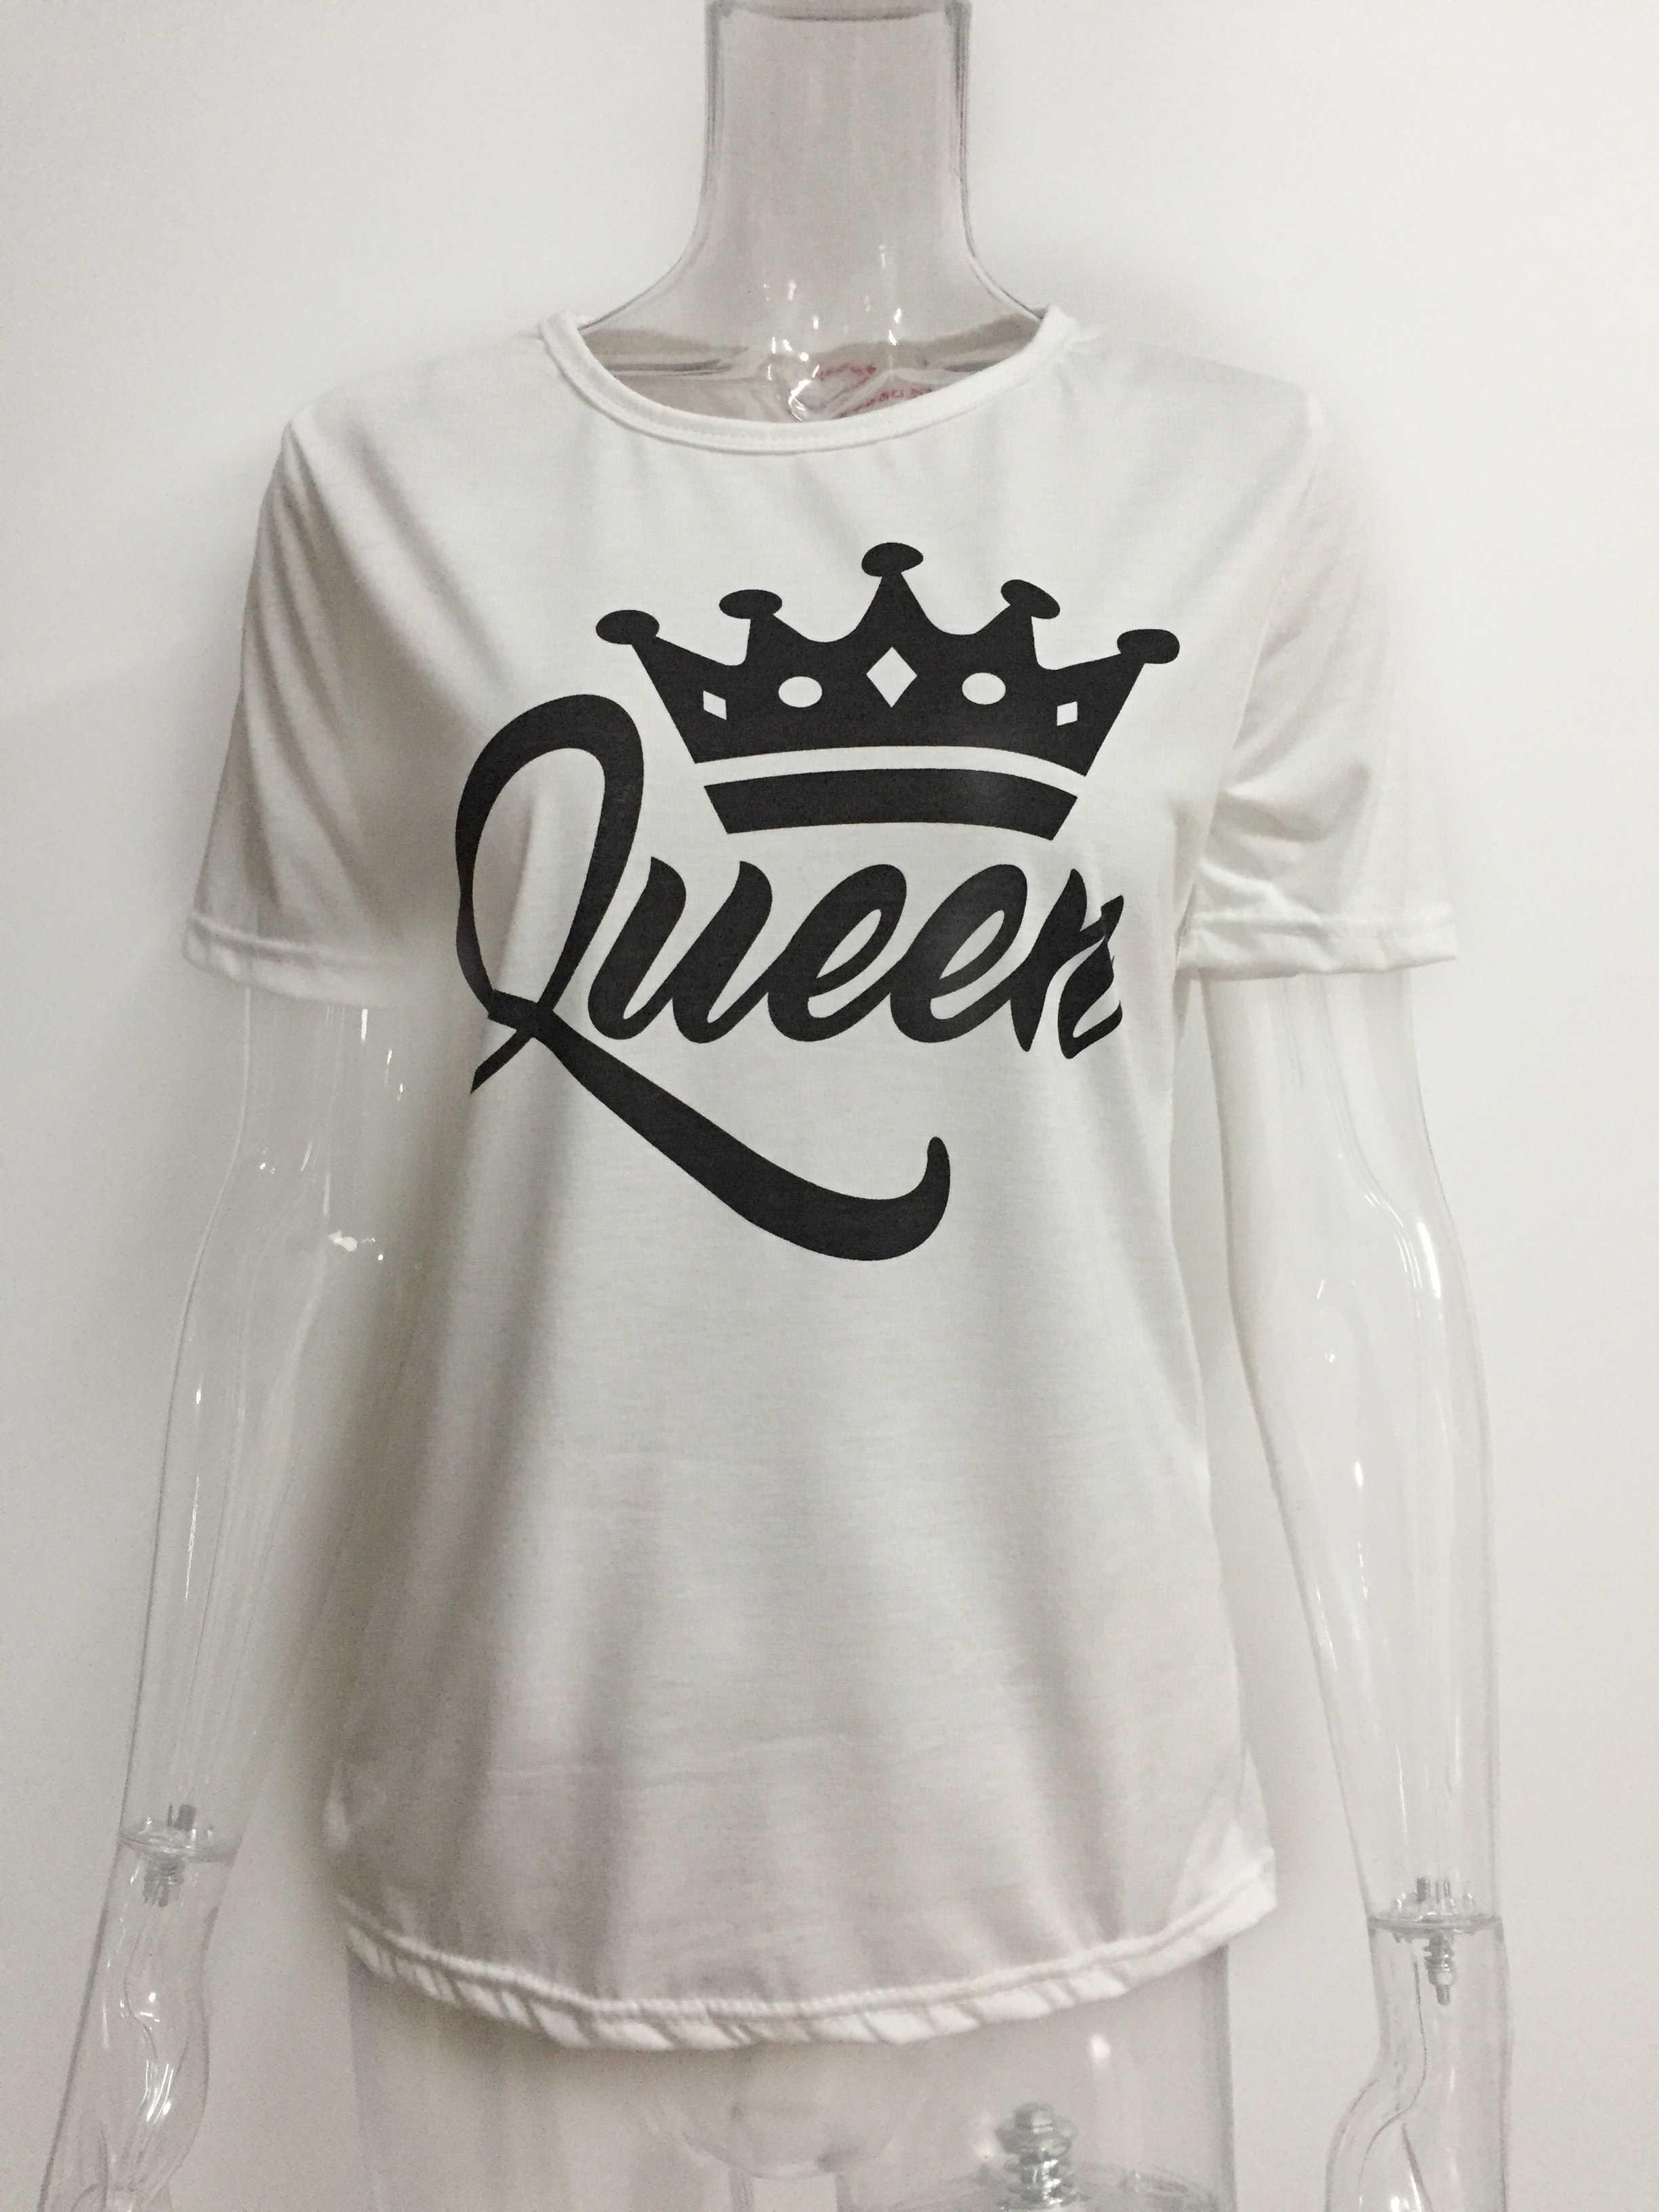 8a72e98974e ... New King Queen Letter Print Short Sleeve T-Shirt Valentine Women White  Black Family Top ...